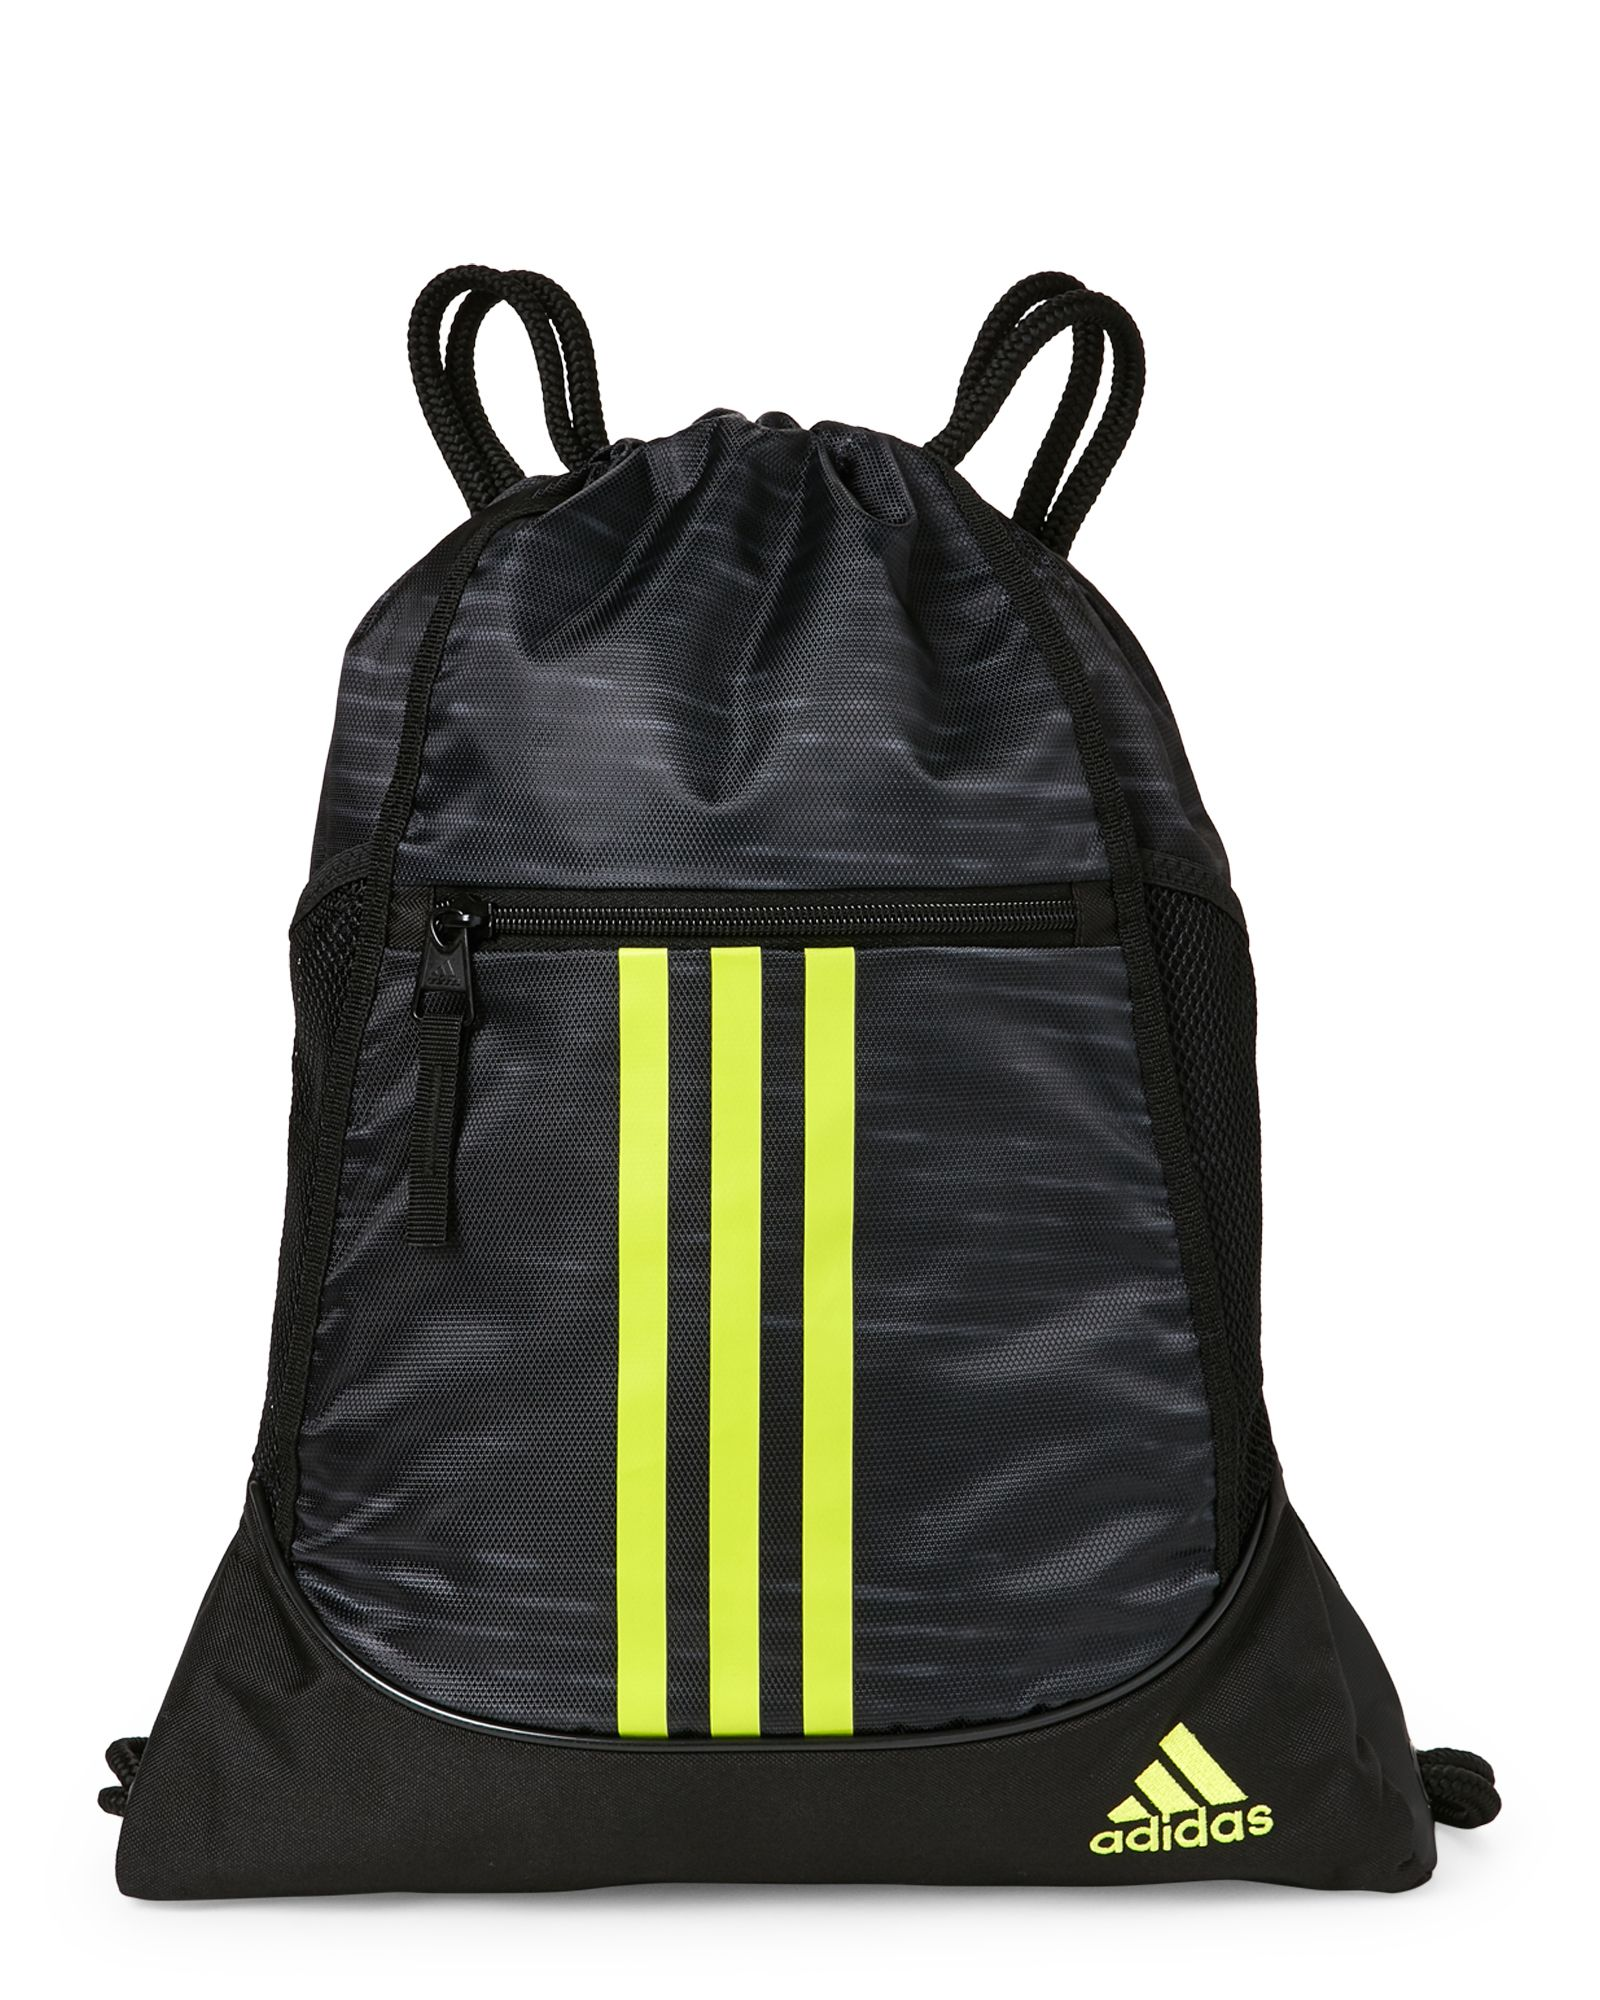 Adidas Illuminated Alliance II Sack